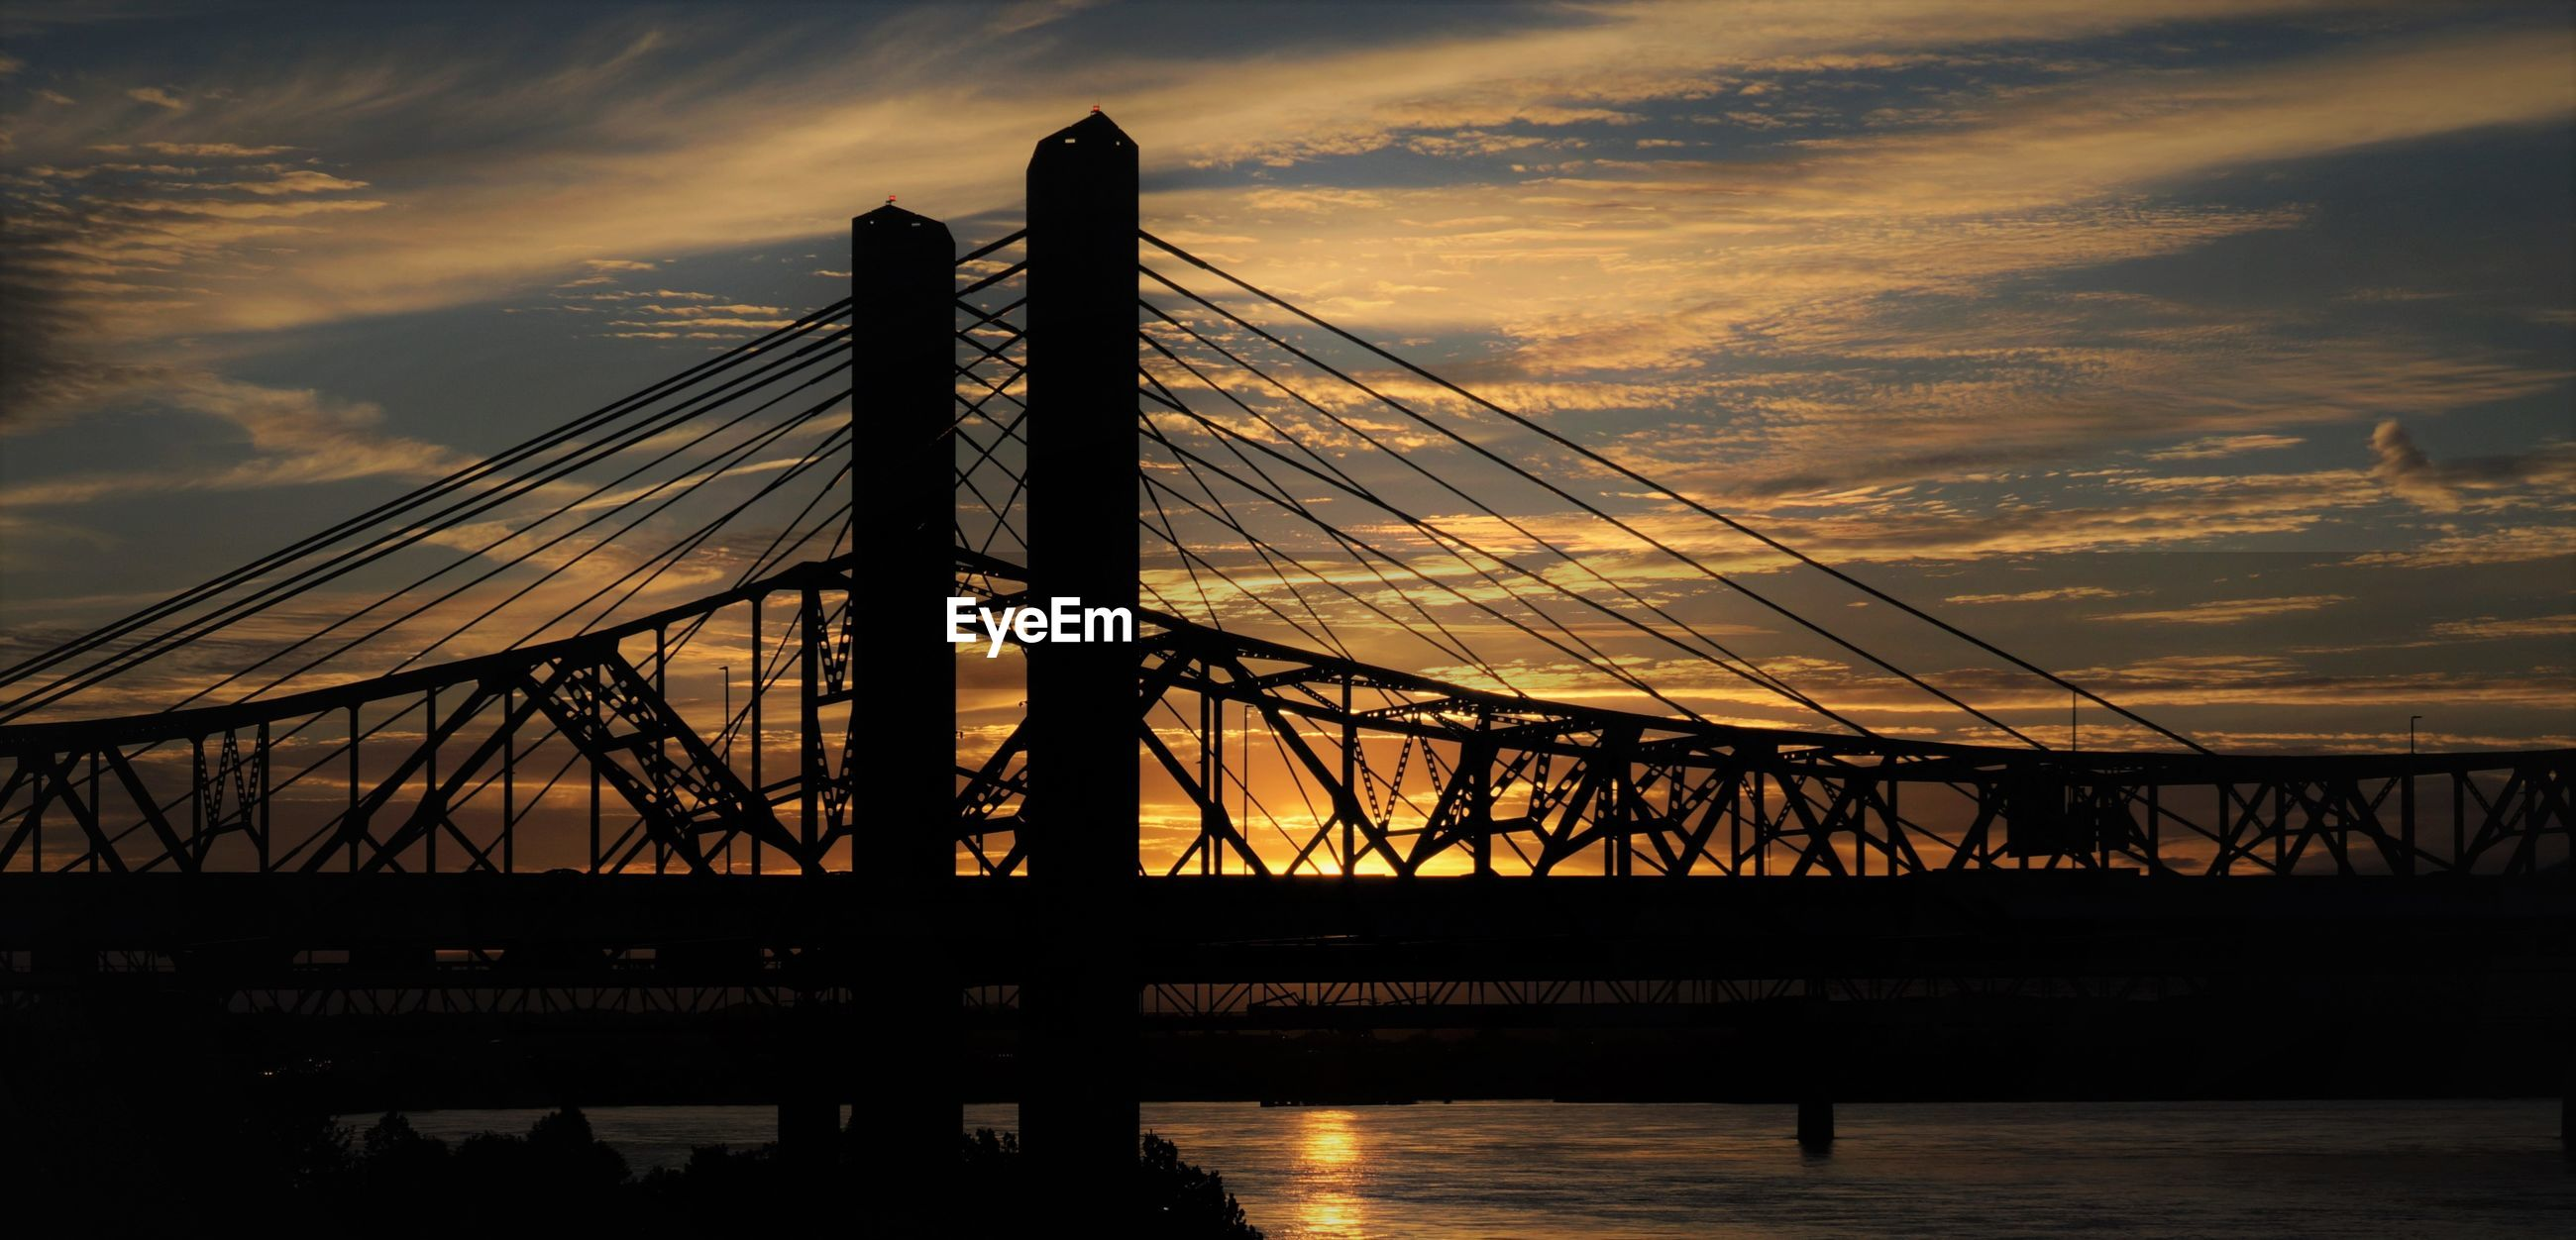 Silhouette bridge against sky at sunset